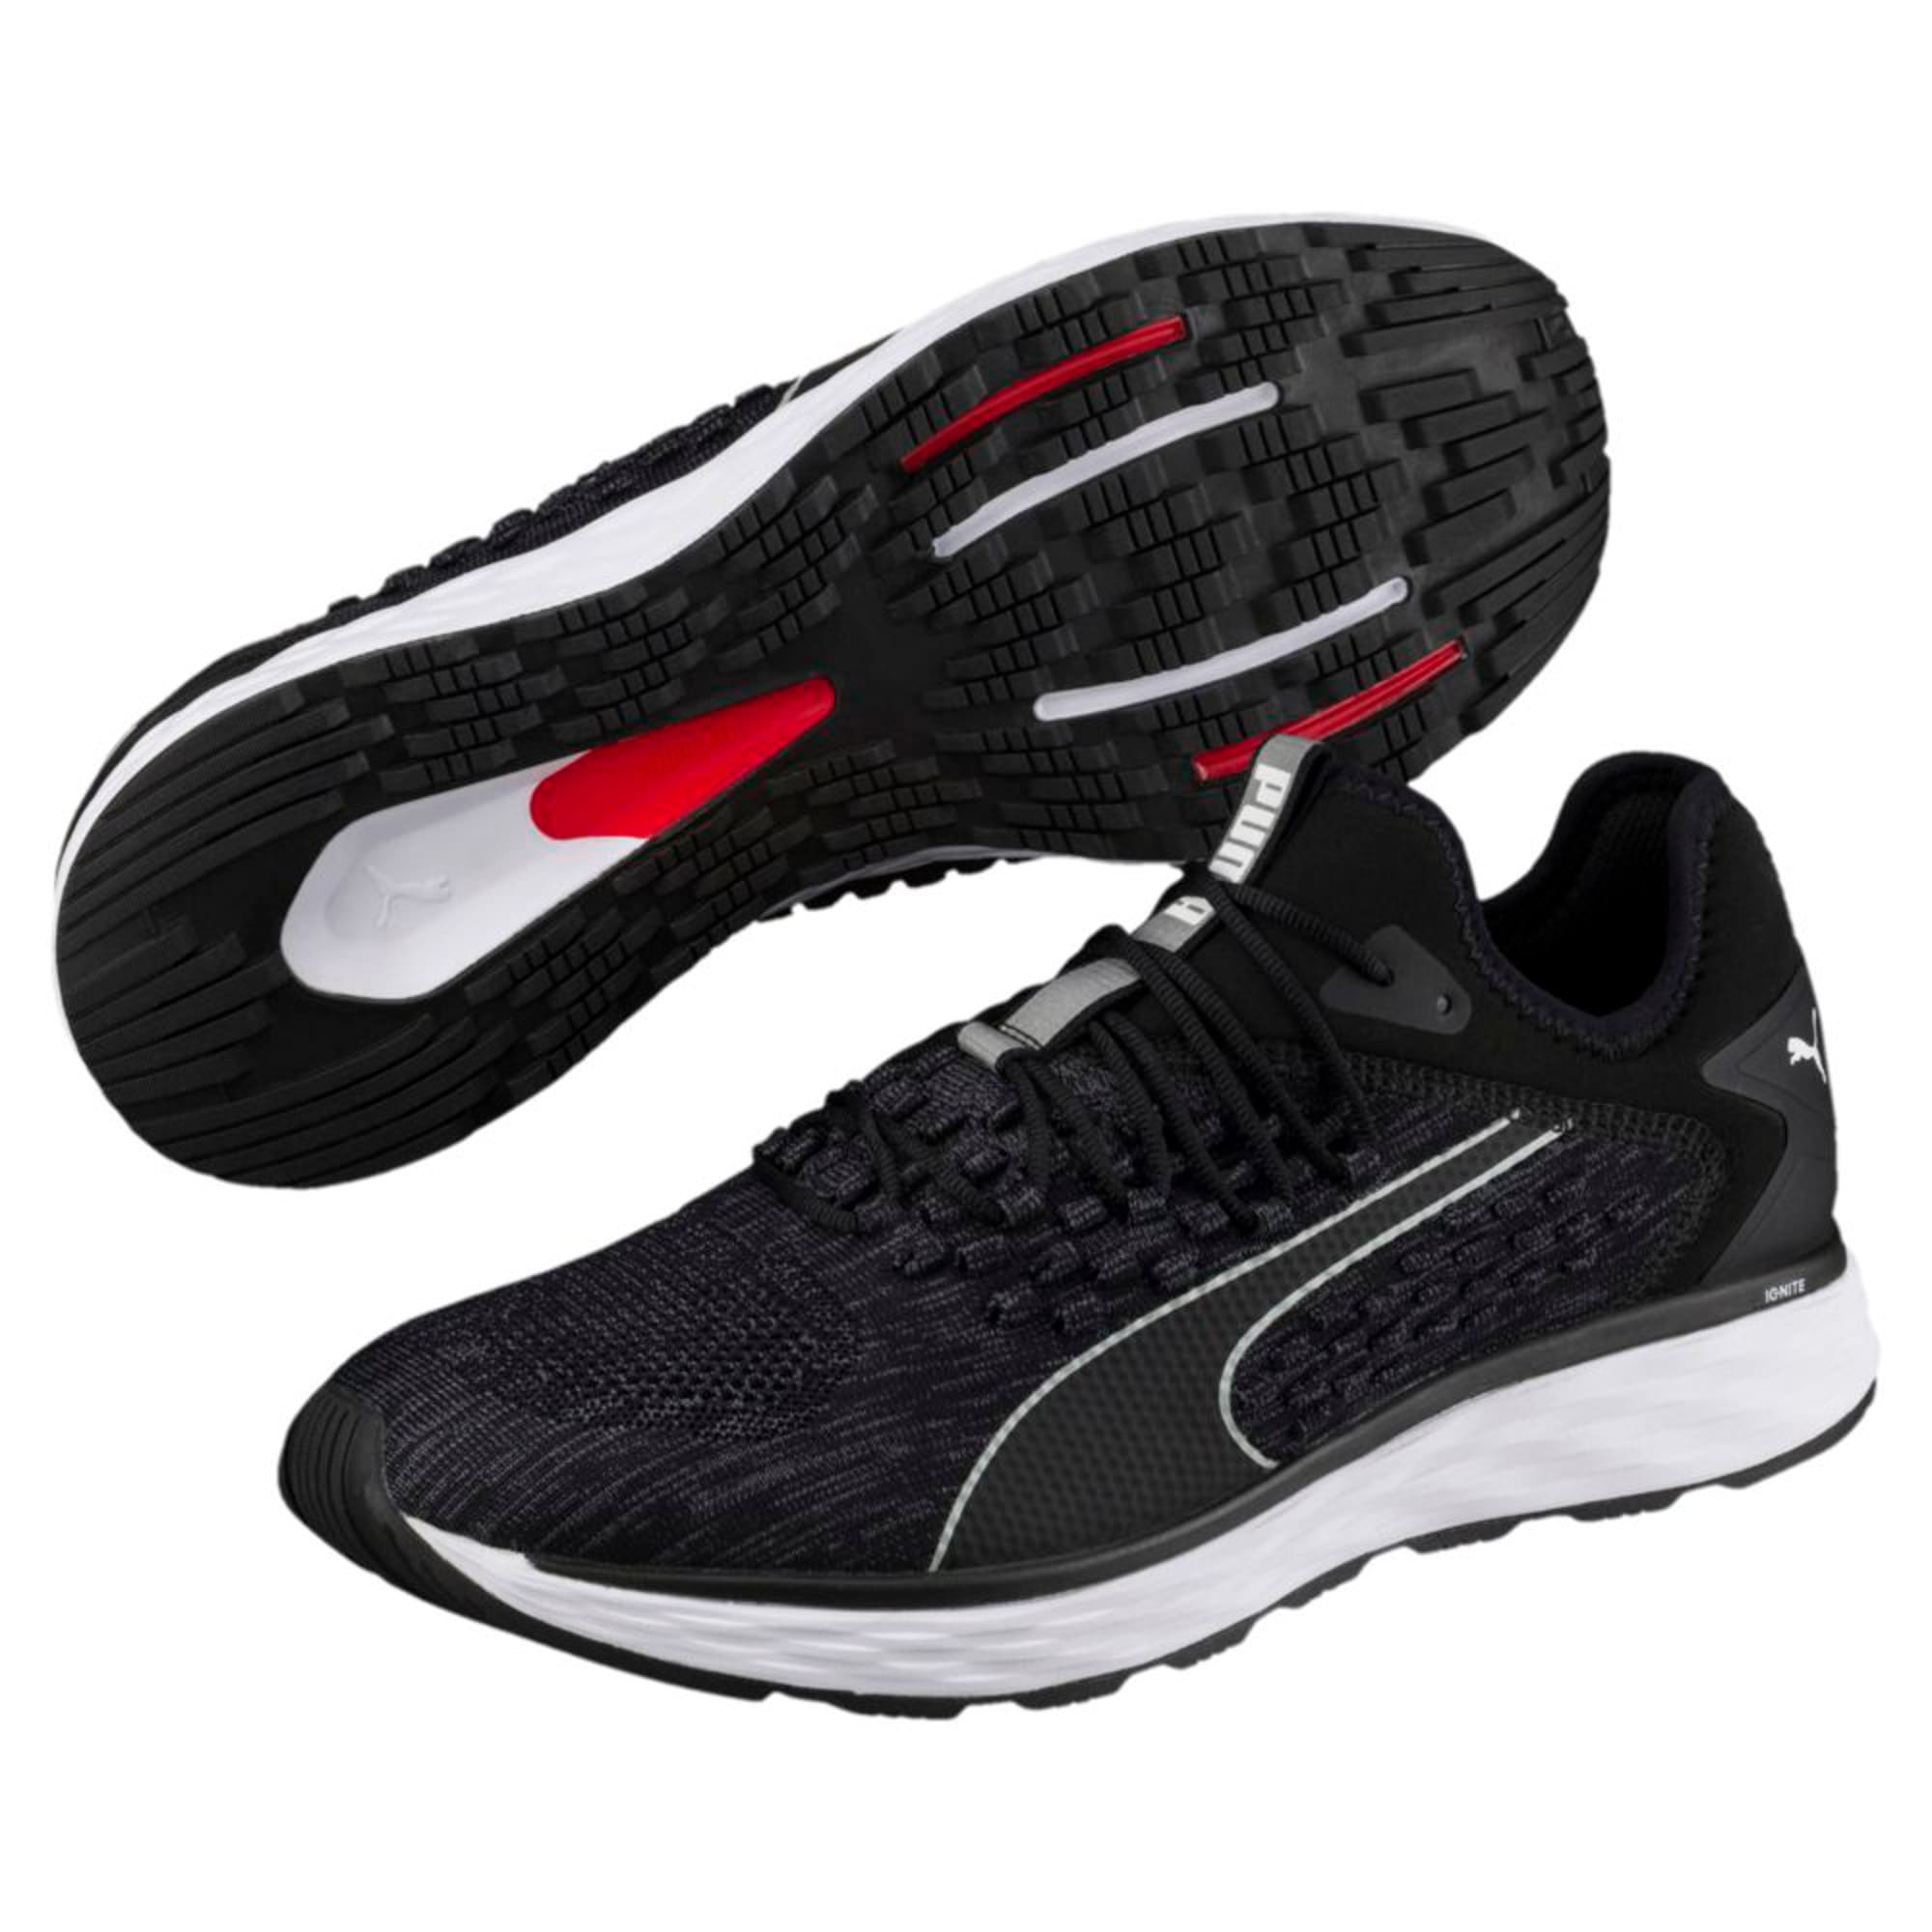 Thumbnail 6 of SPEED FUSEFIT Men's Running Shoes, Puma Black-Iron Gate, medium-IND